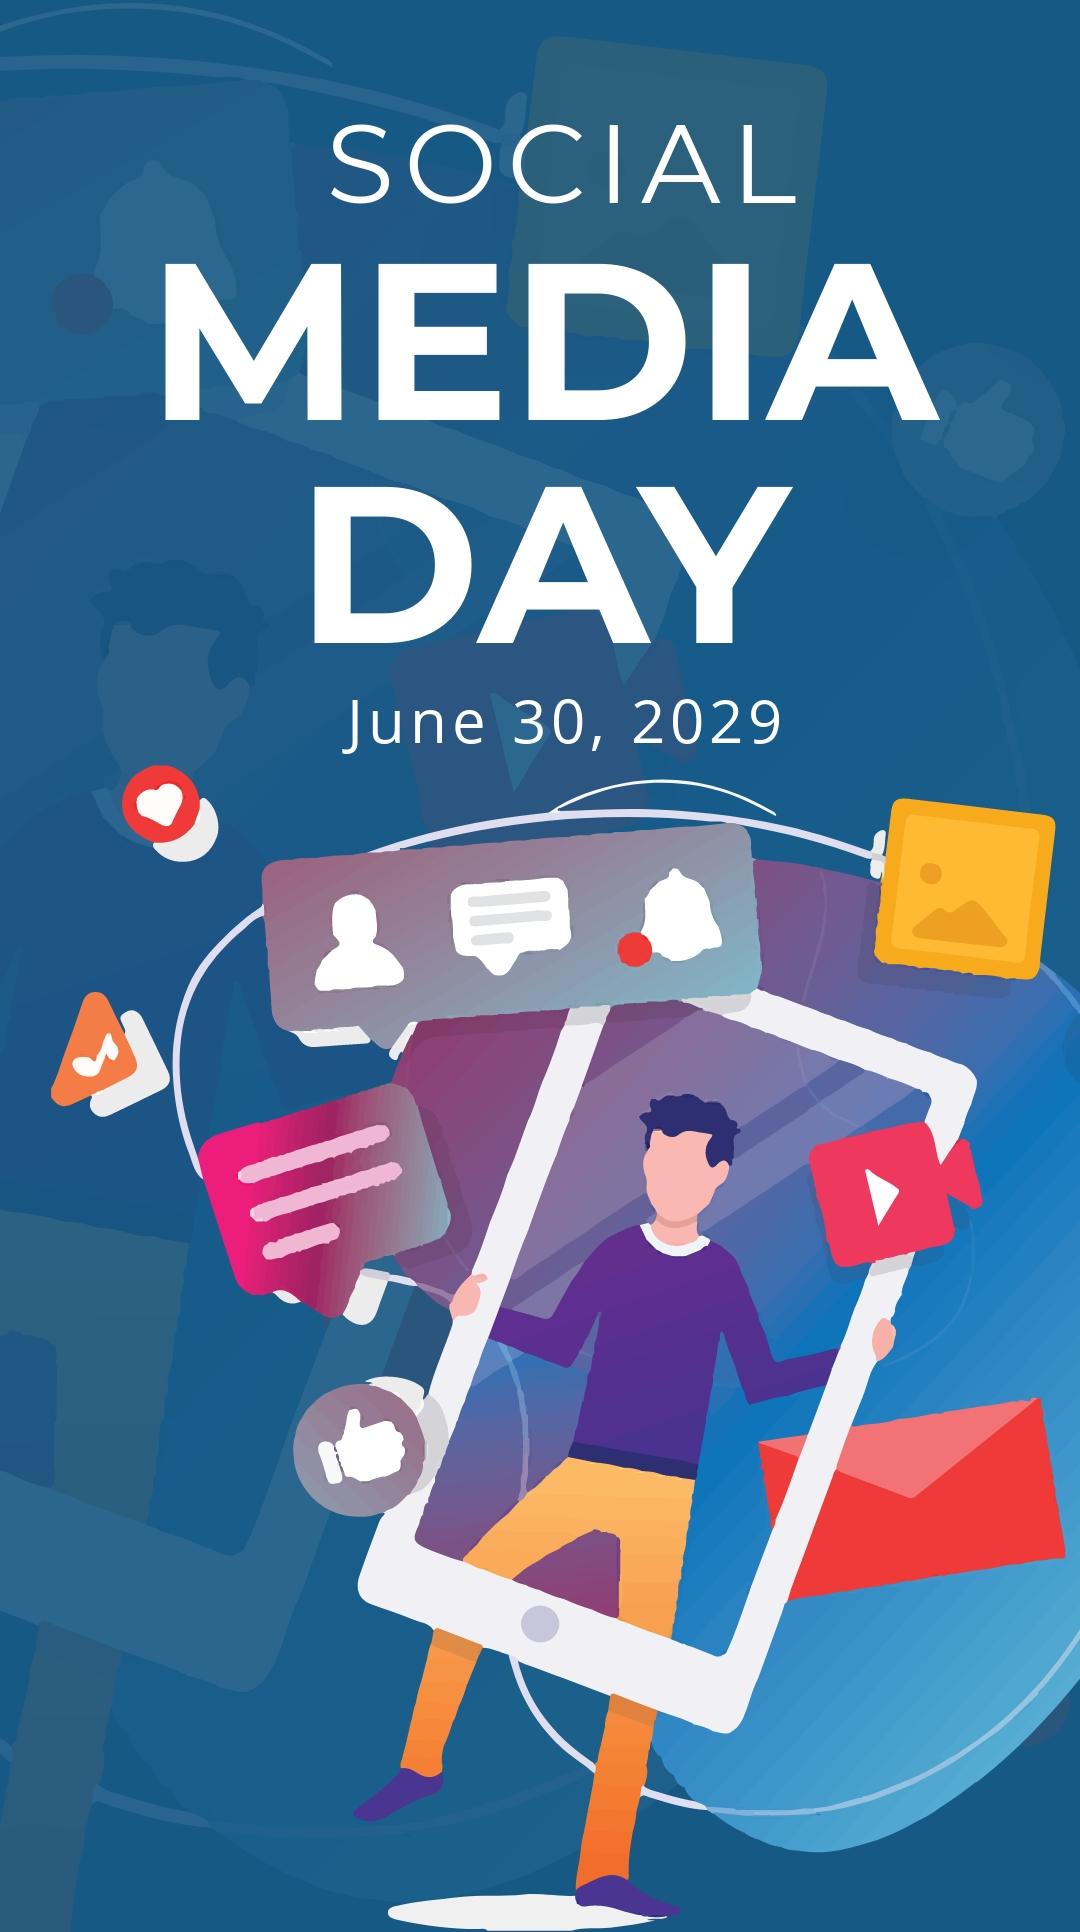 Free Social Media Day Whatsapp Image Template.jpe